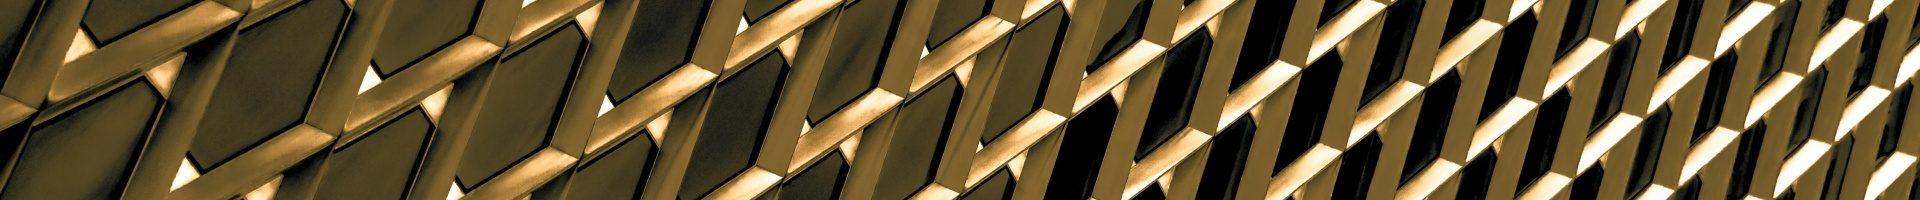 golden_building_closeup-wallpaper-1920x1080